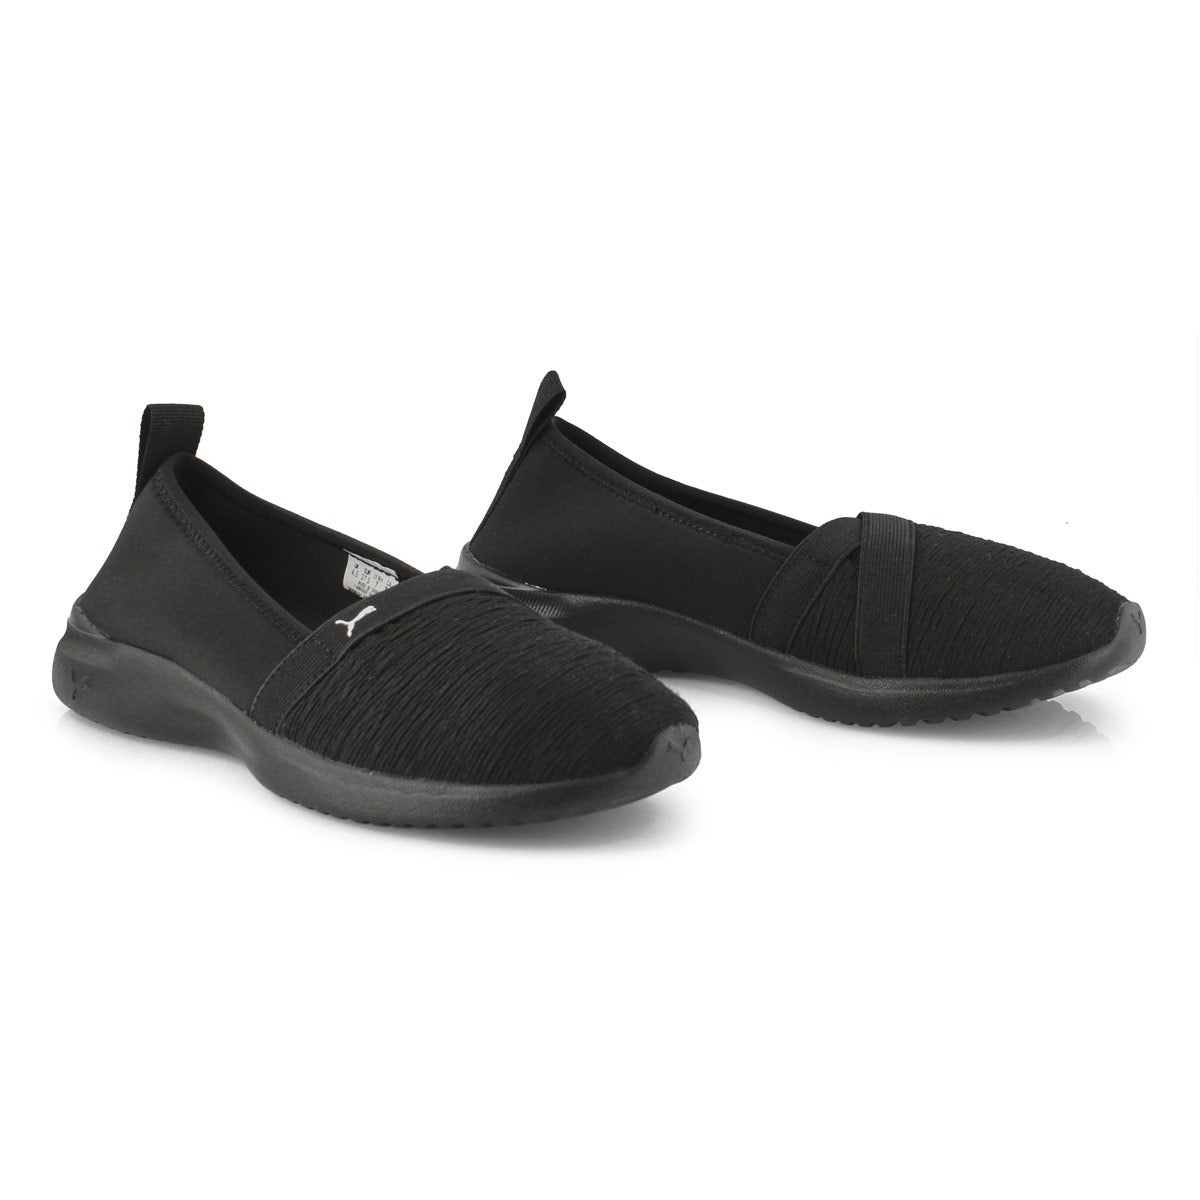 Women's Adelina Shoe - Black/Black